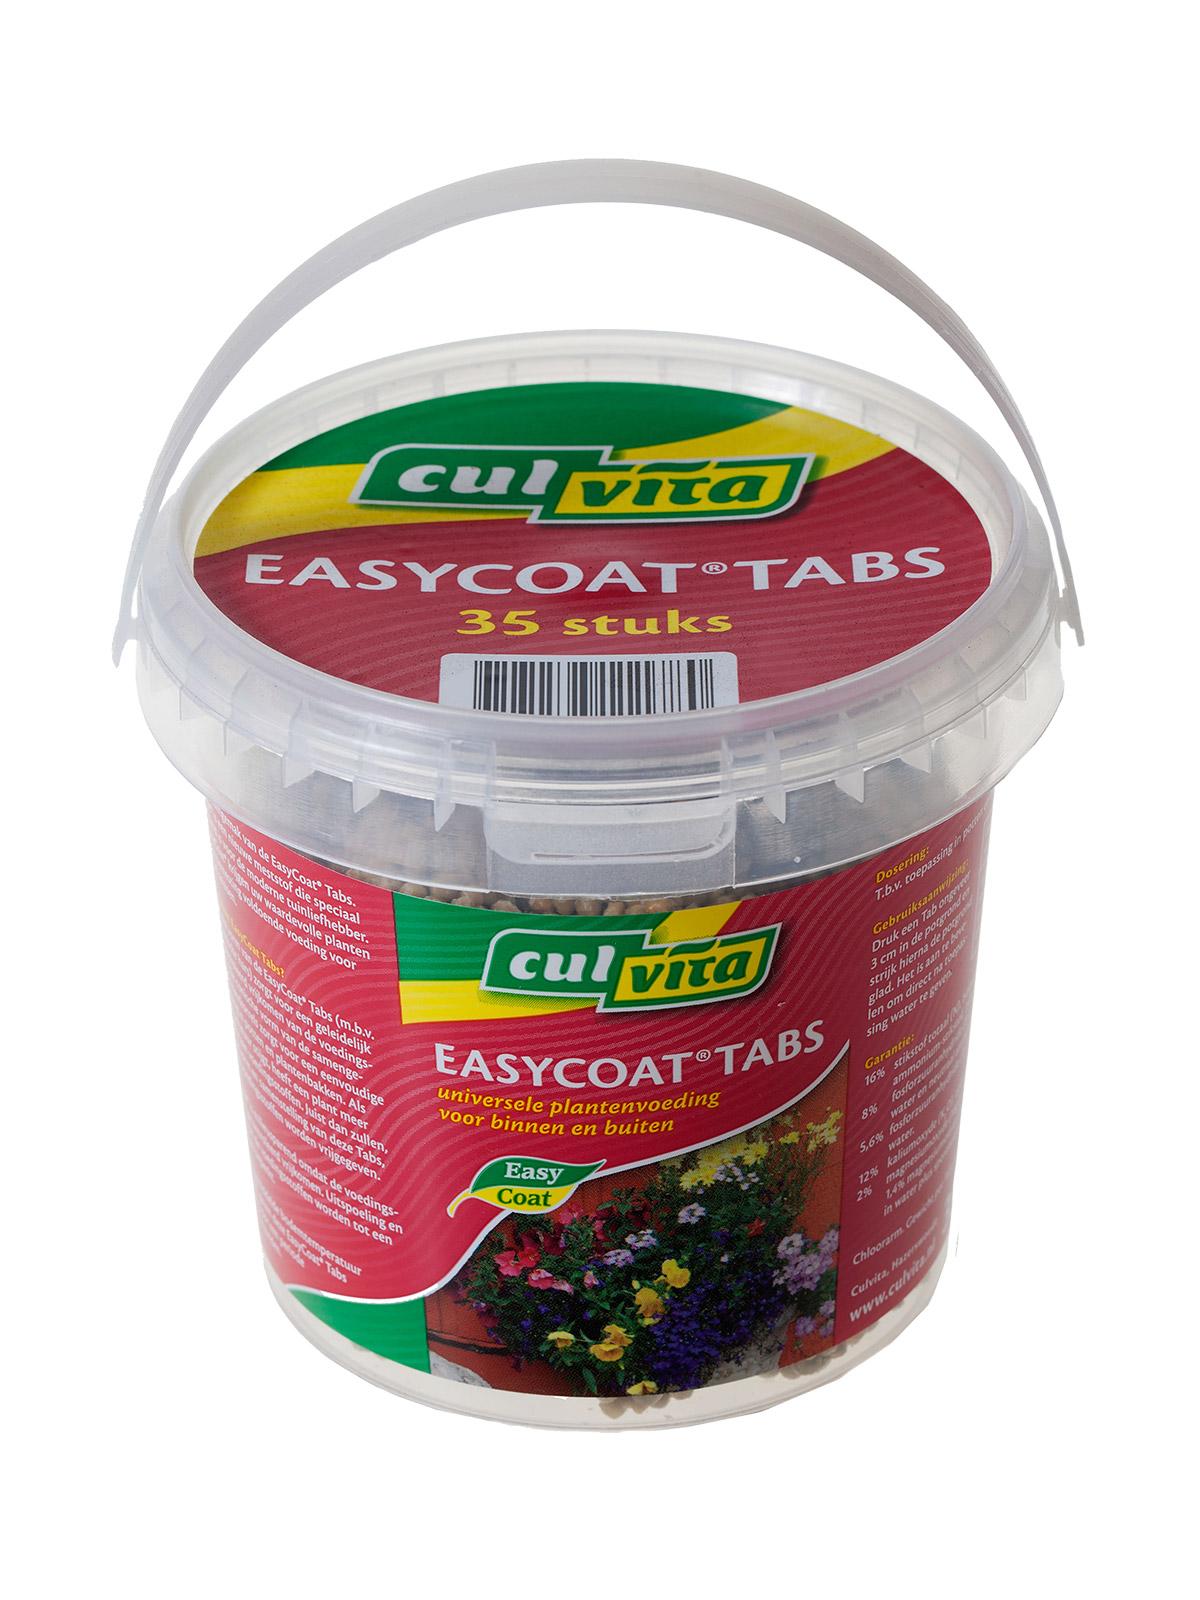 Culvita EasyCoat Tabs | Culvita.nl